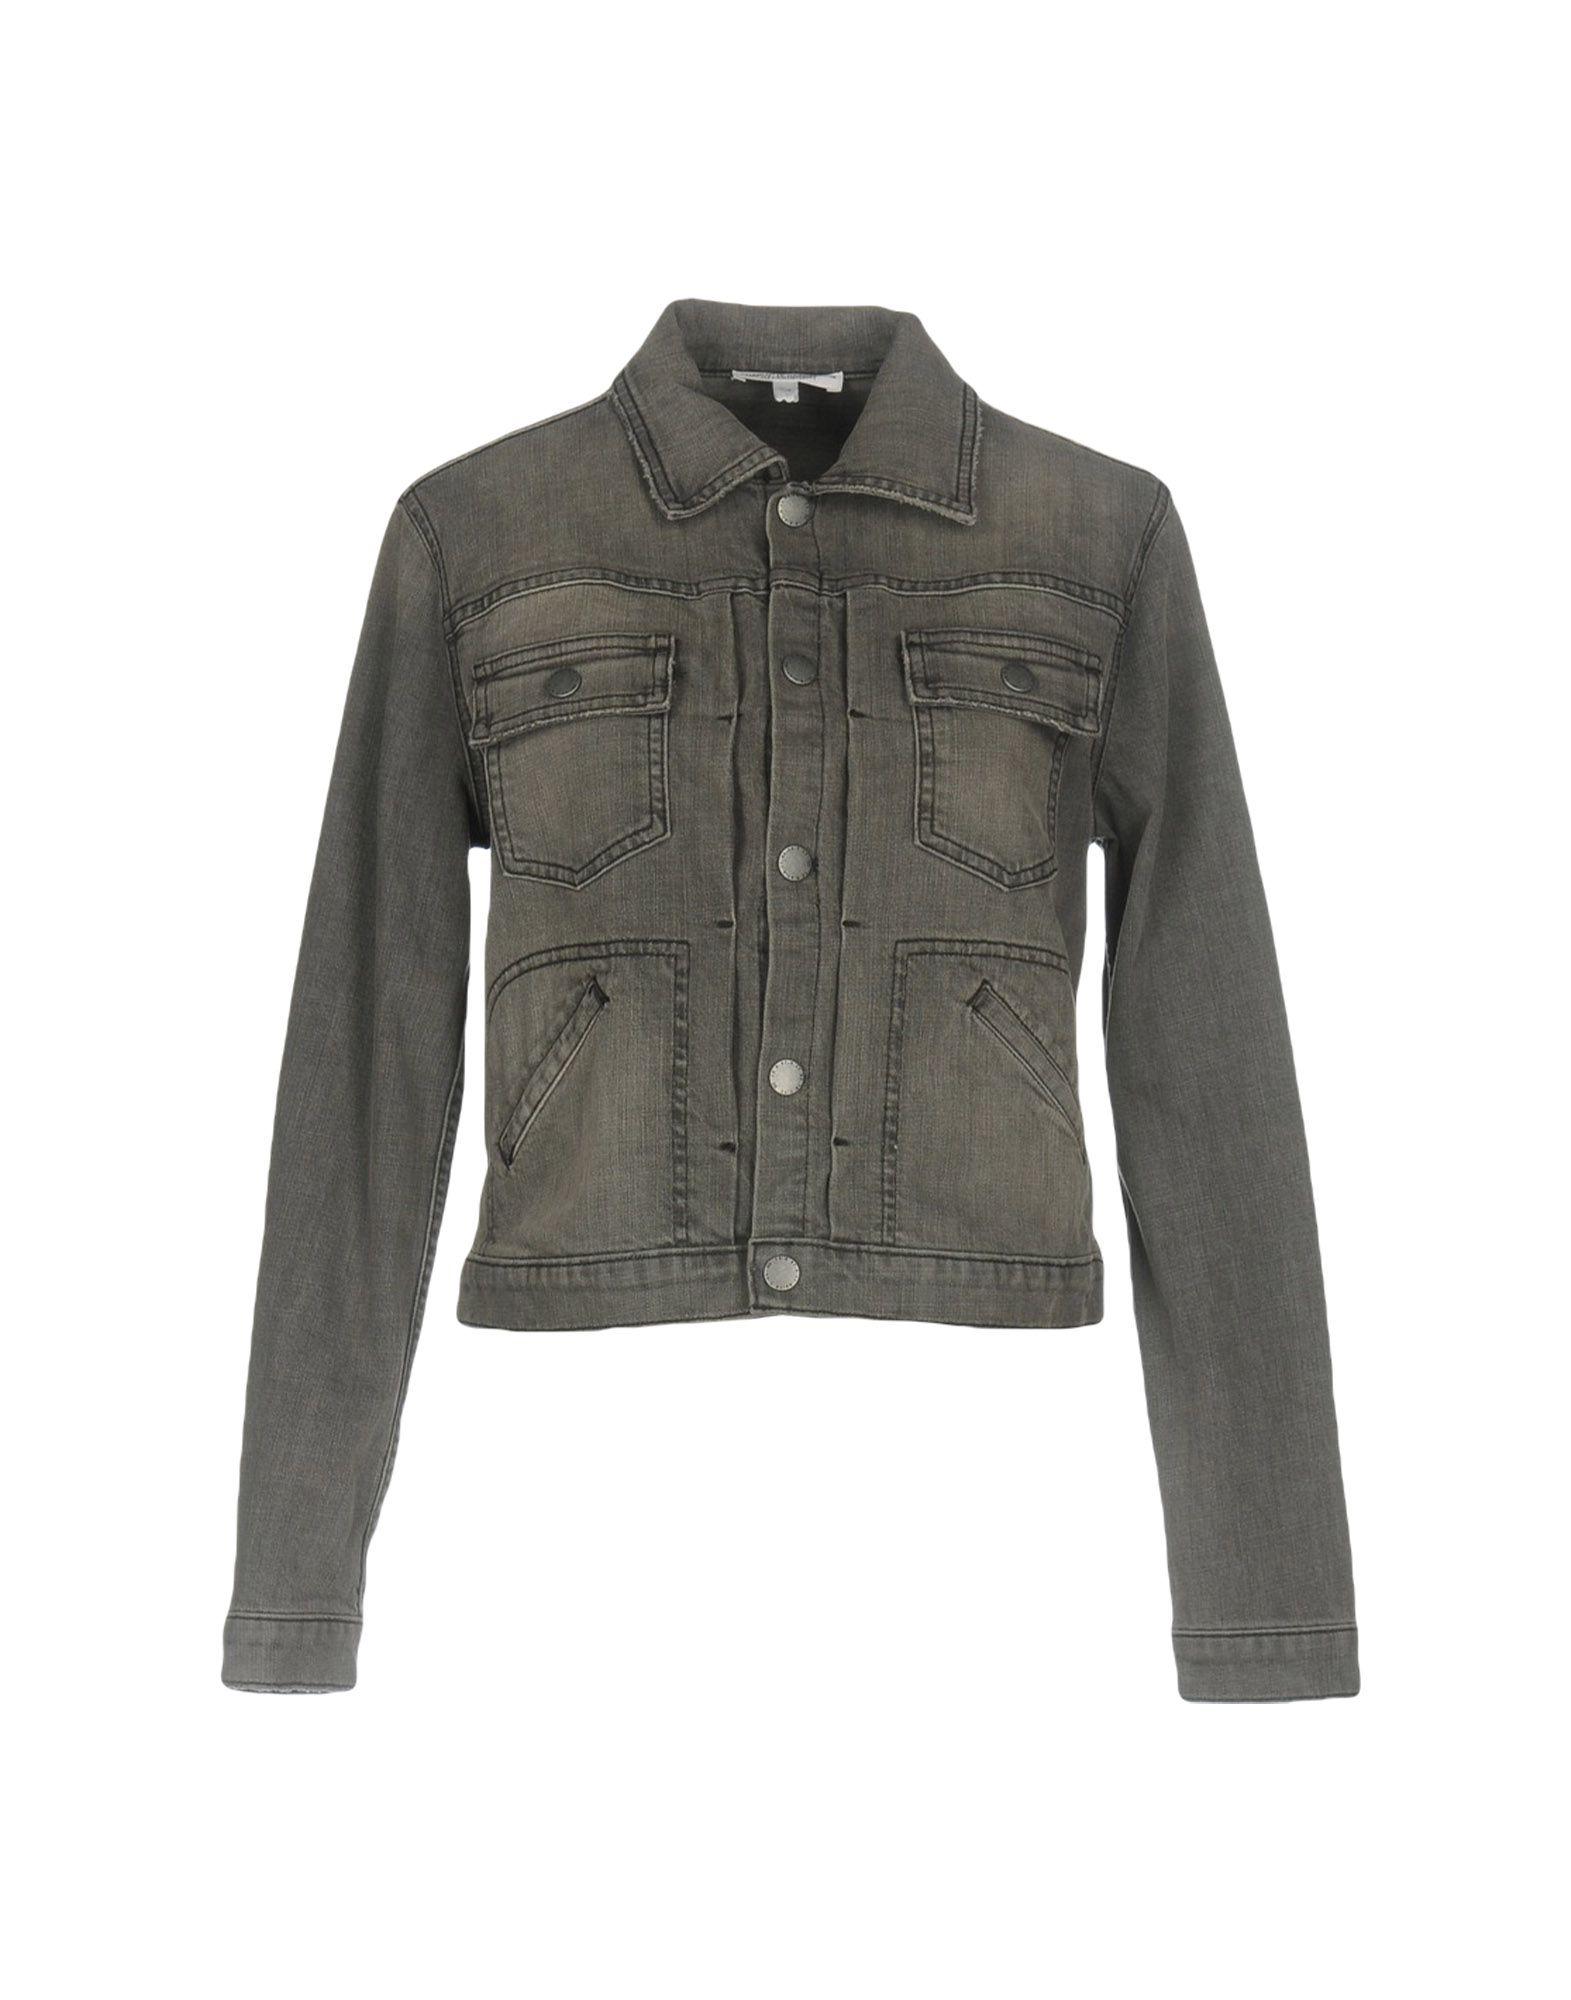 CURRENT/ELLIOT + CHARLOTTE GAINSBOURG Джинсовая верхняя одежда цена 2017